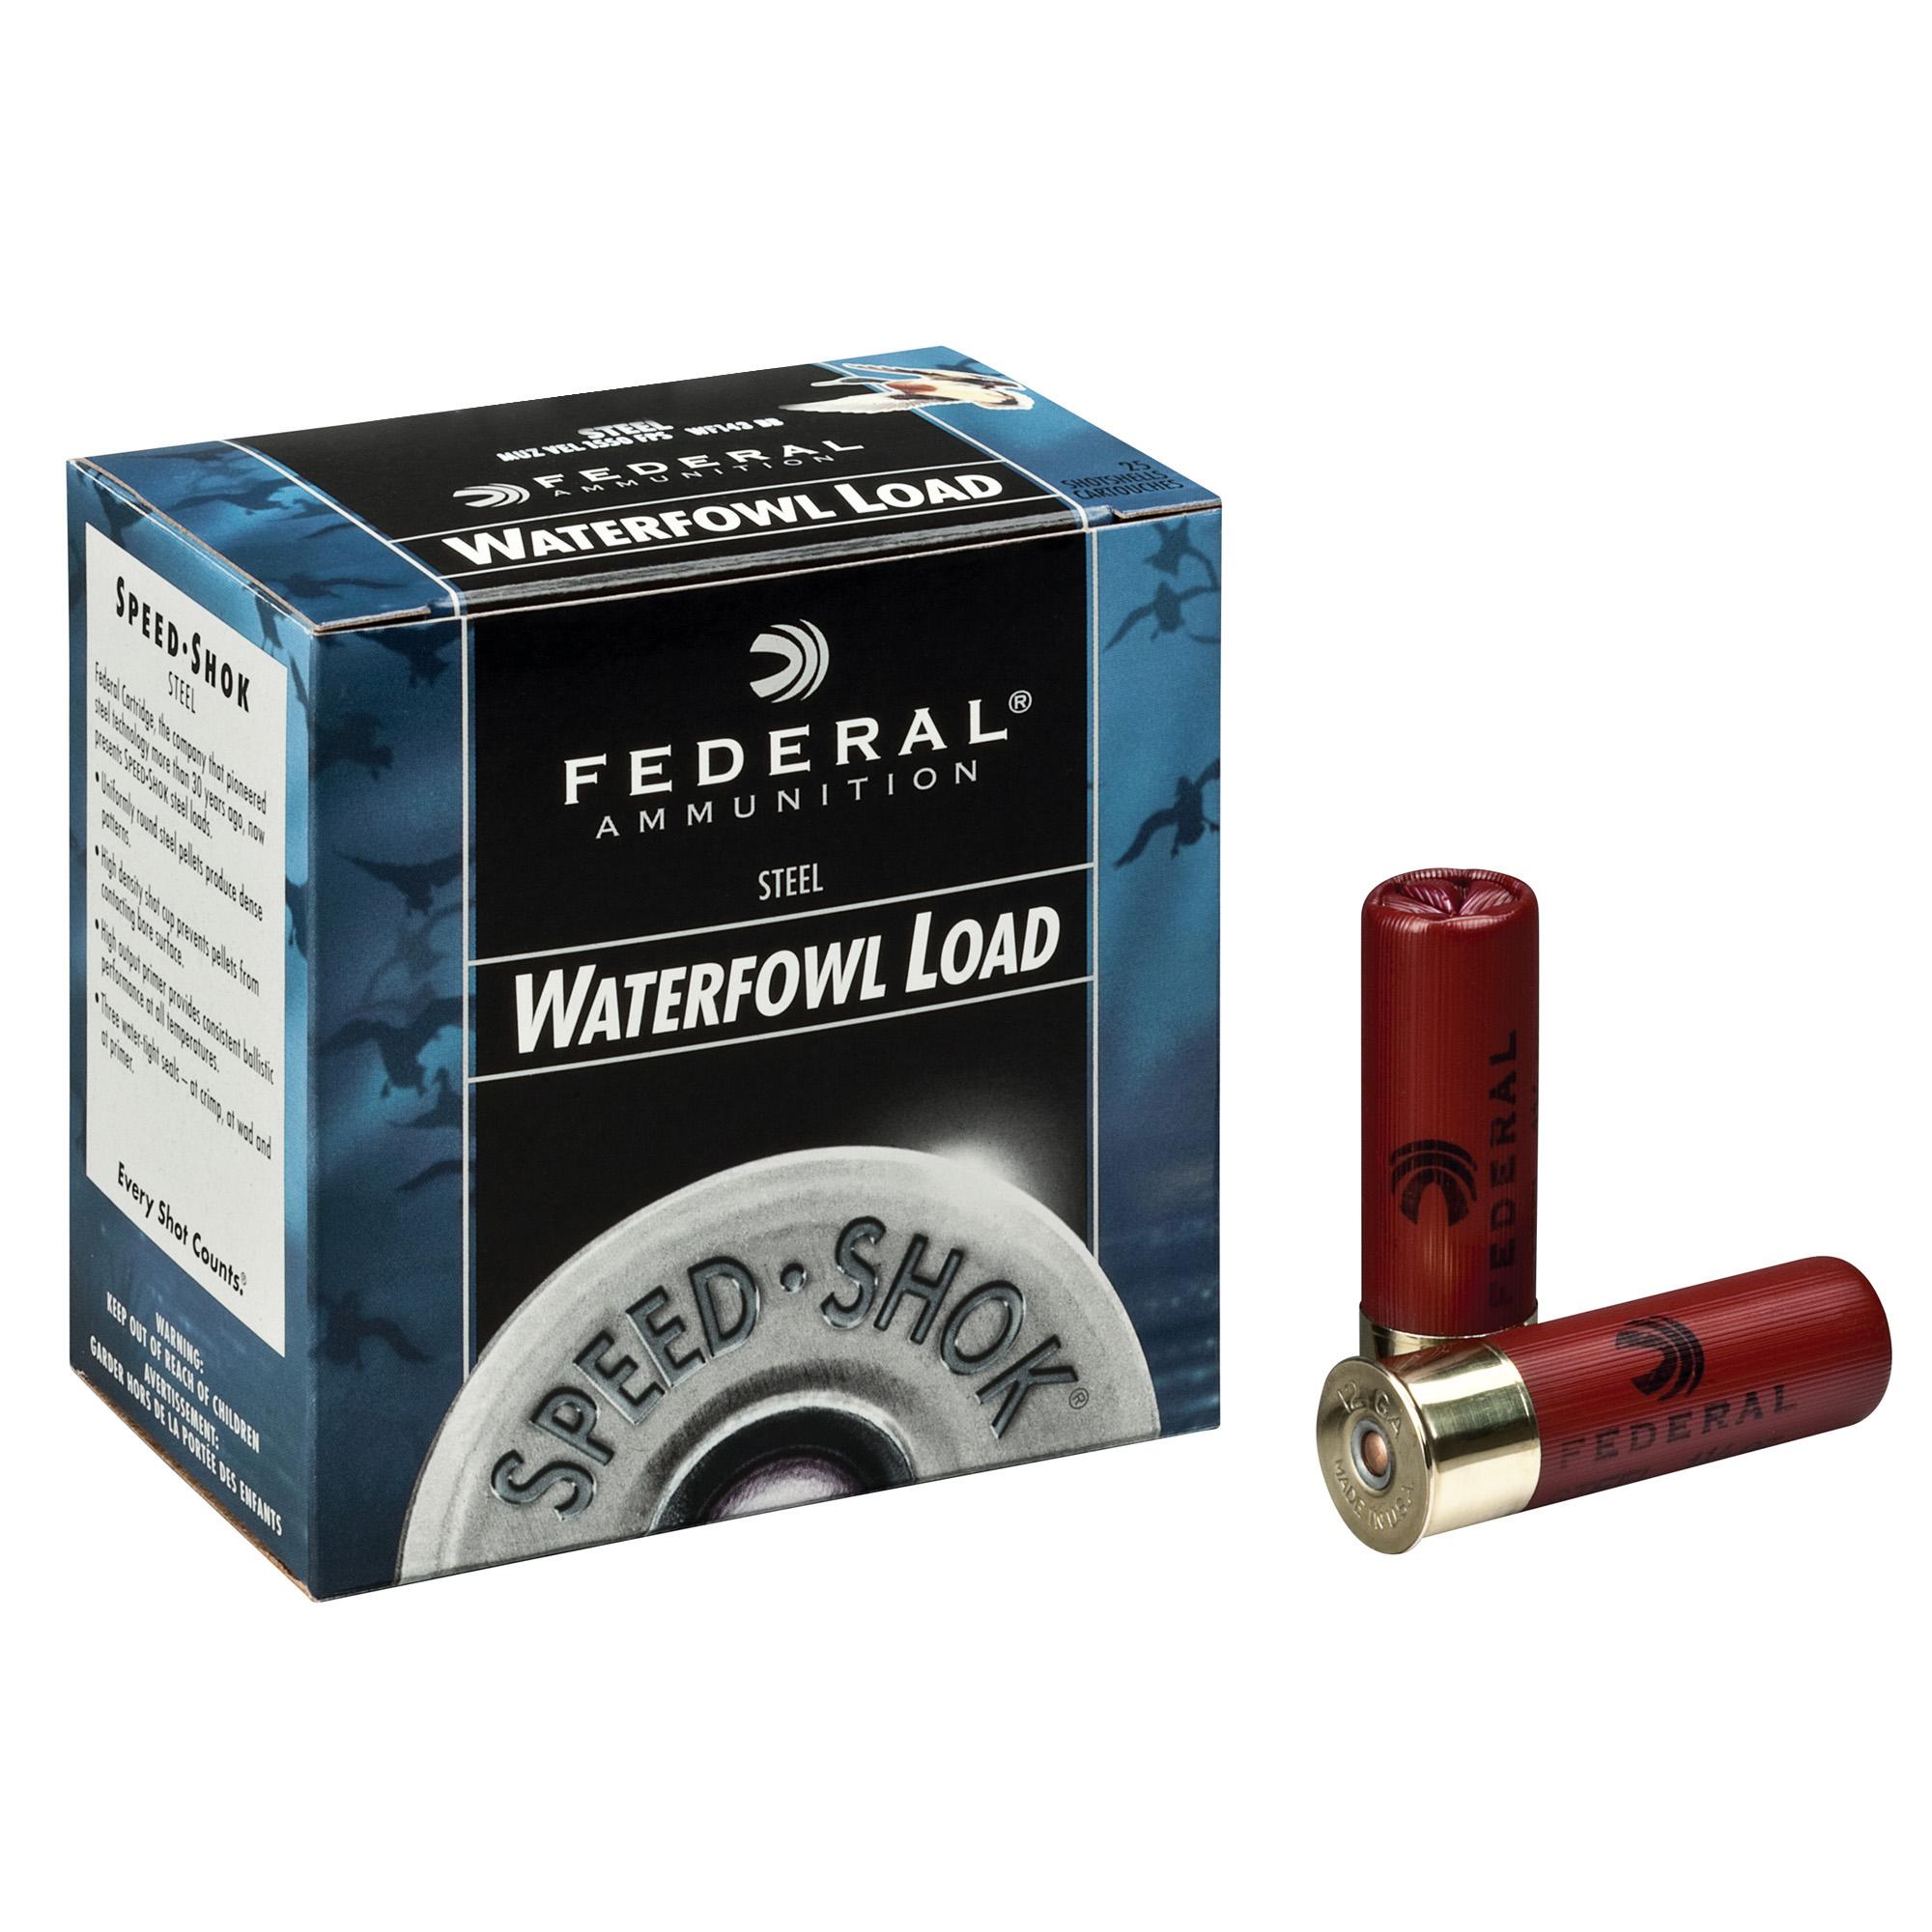 Federal Premium Speed-Shok Waterfowl 12ga, 3in, 1-1/8oz, #2 Shot Ammo